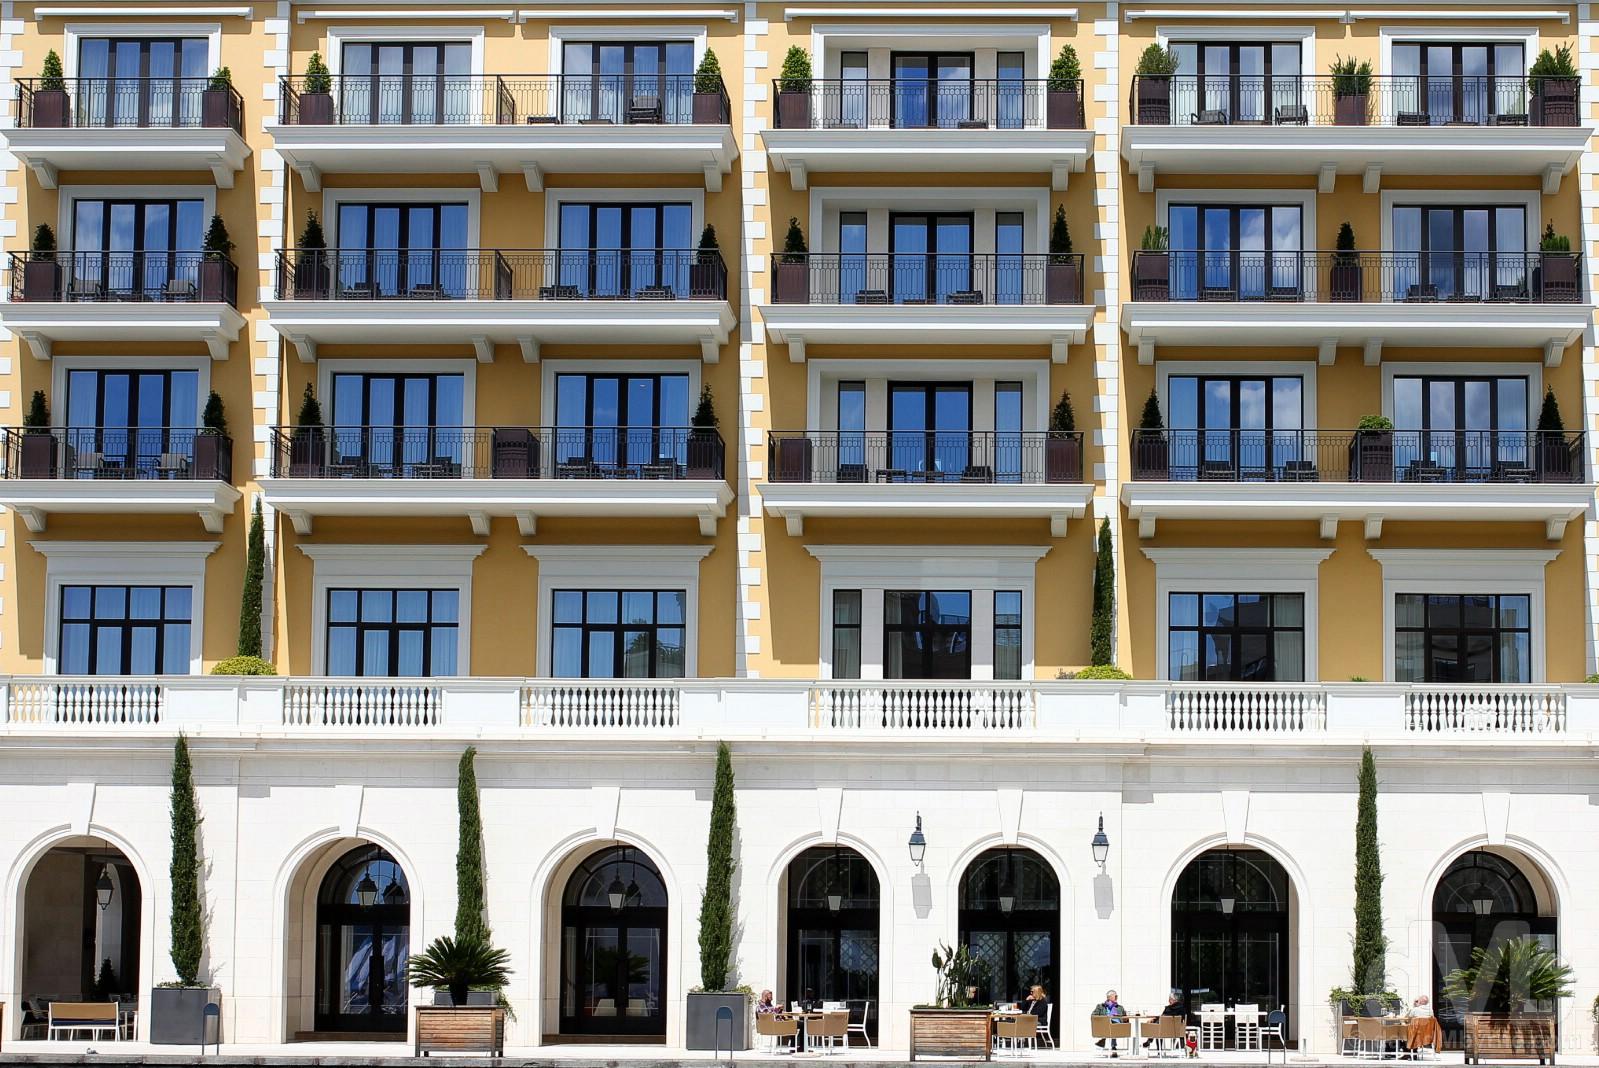 Regent Hotel & Residences, Porto Montenegro, Montenegro. April 20, 2017.